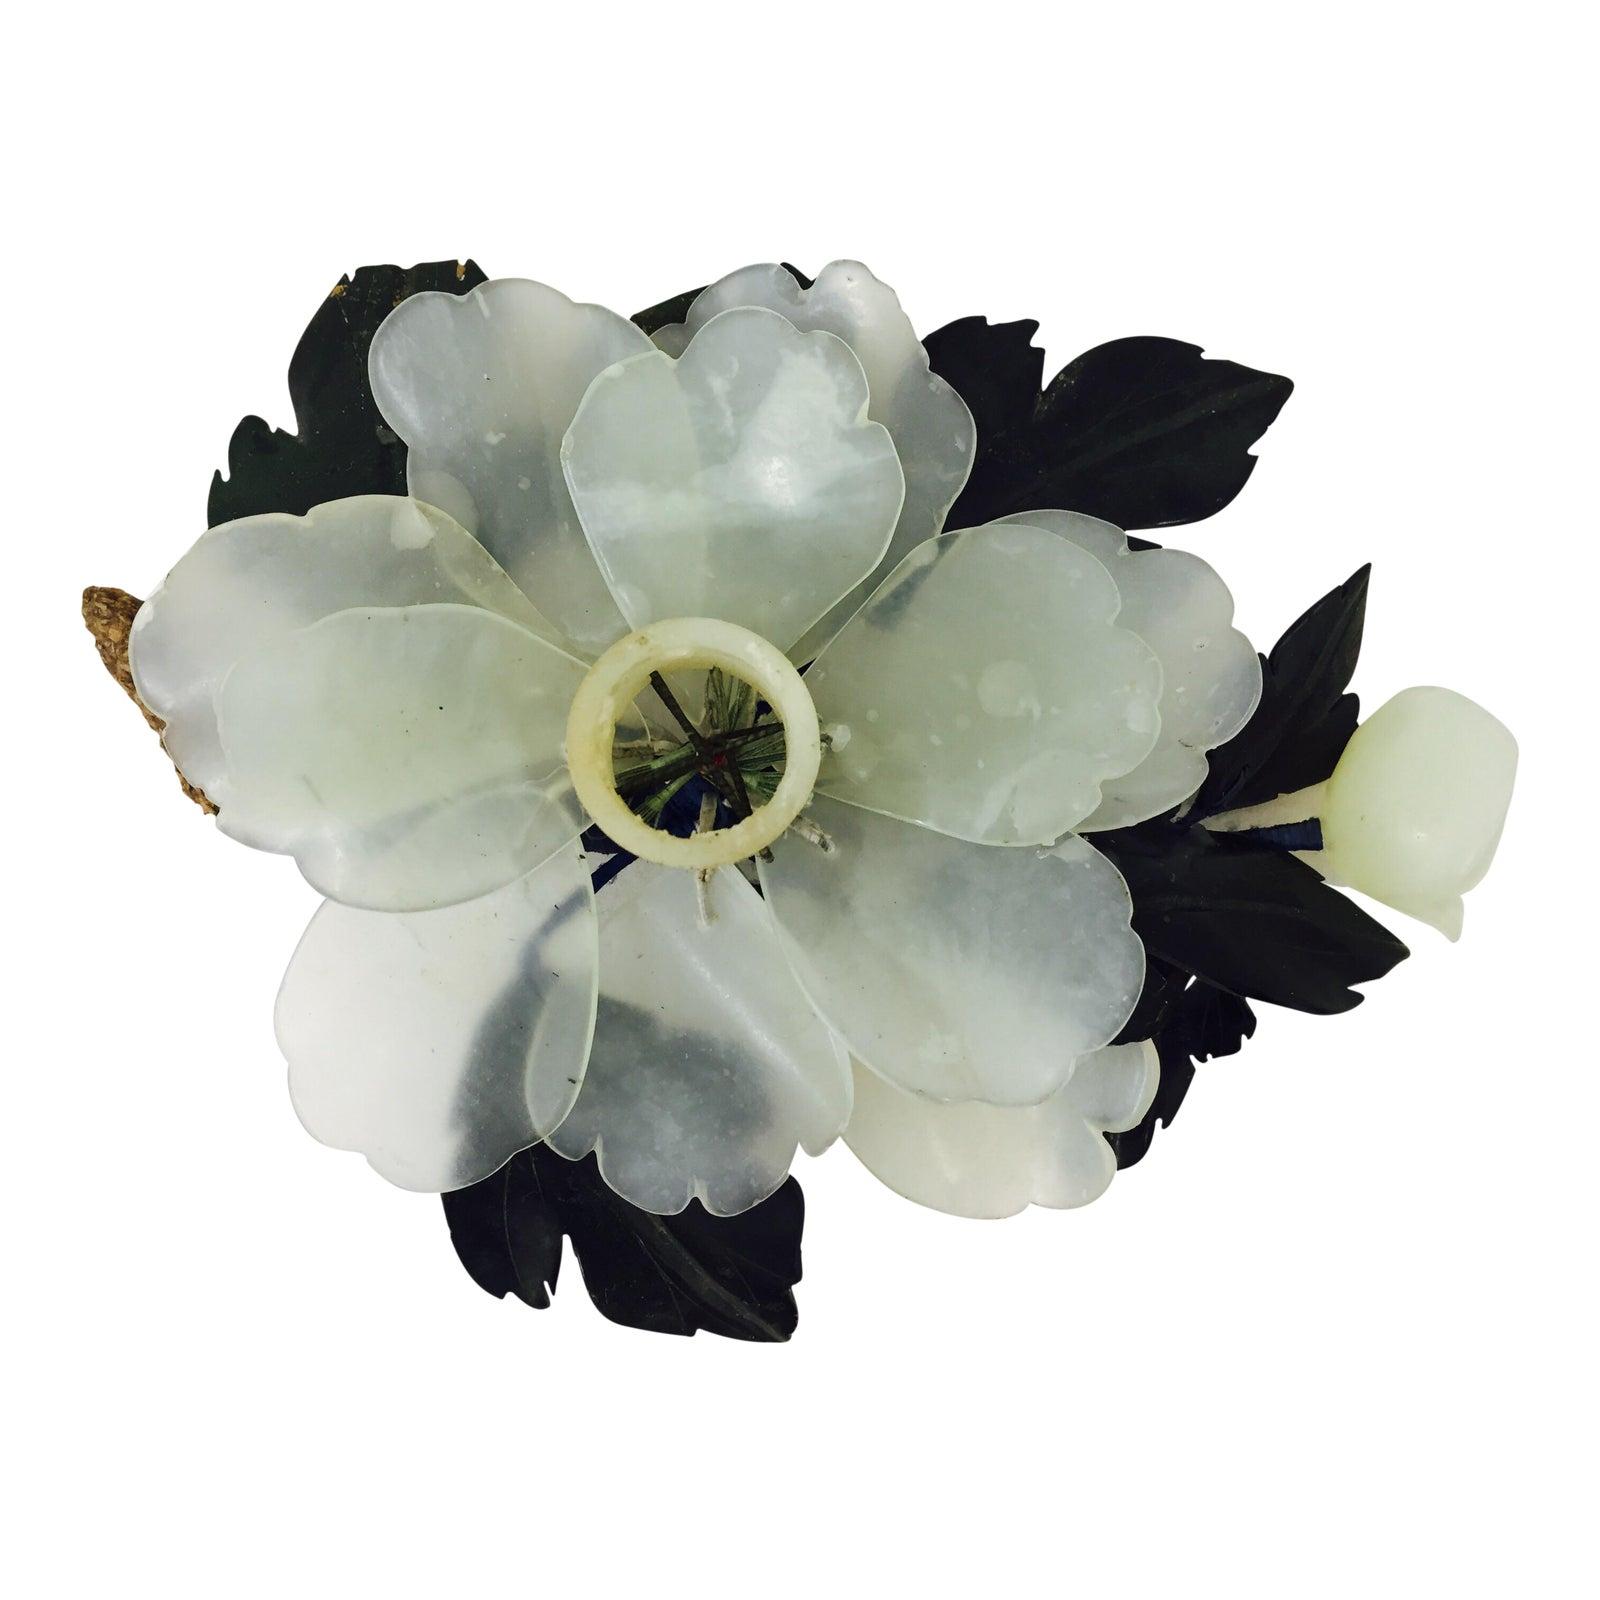 Antique Jade Flower Candle Holder Chairish